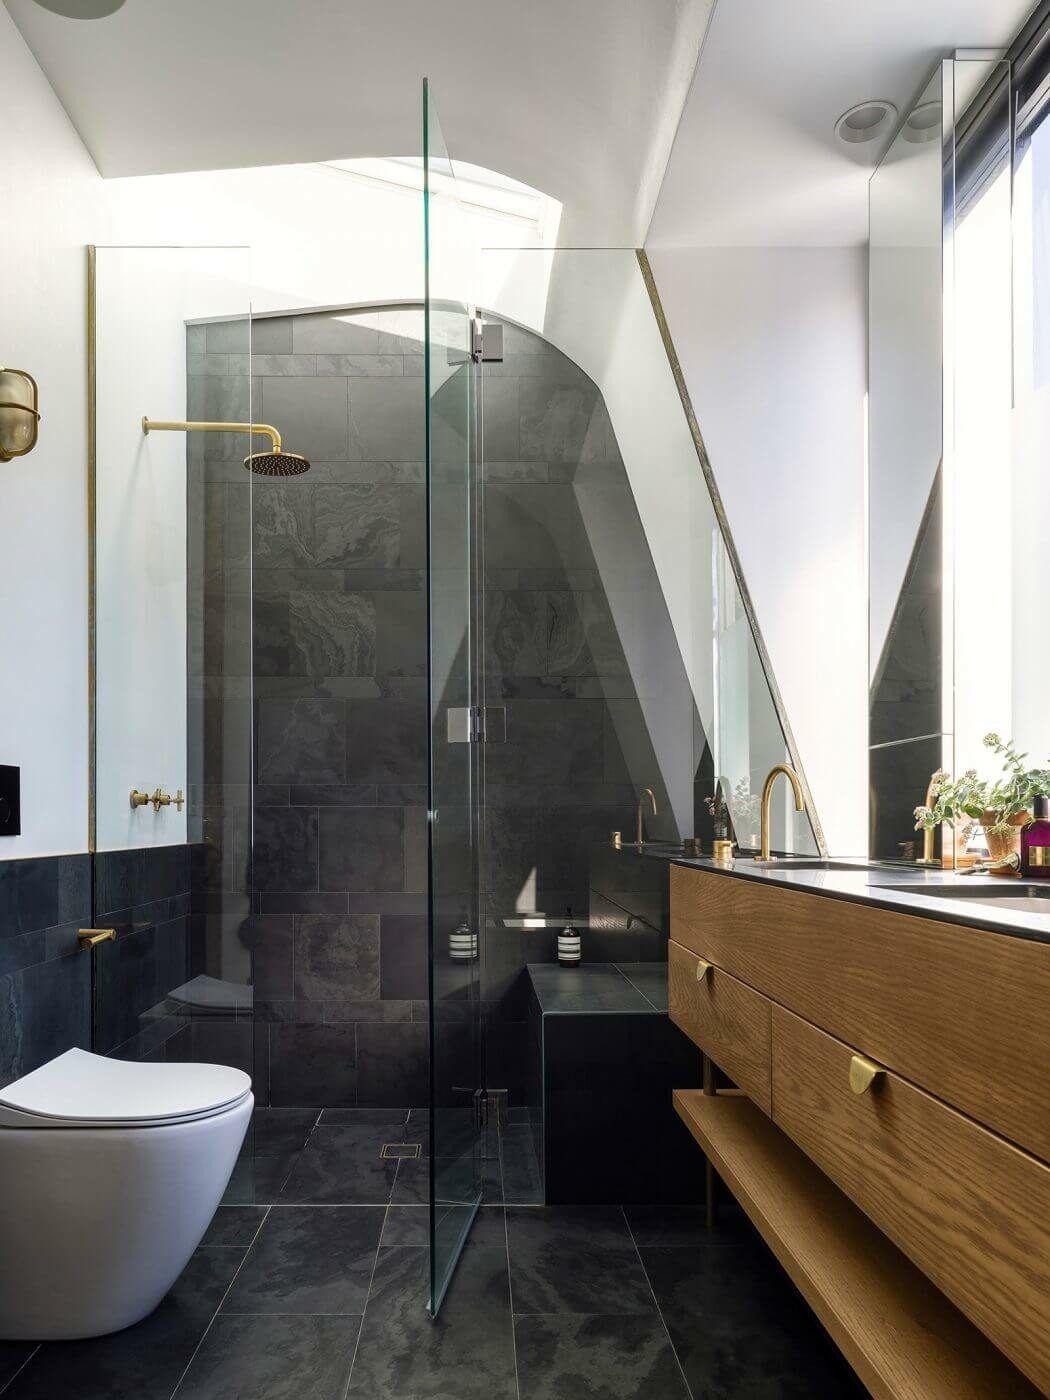 luigi-rosselli-architects-directors-cut-on-architecture-019-1050x1400-1355538